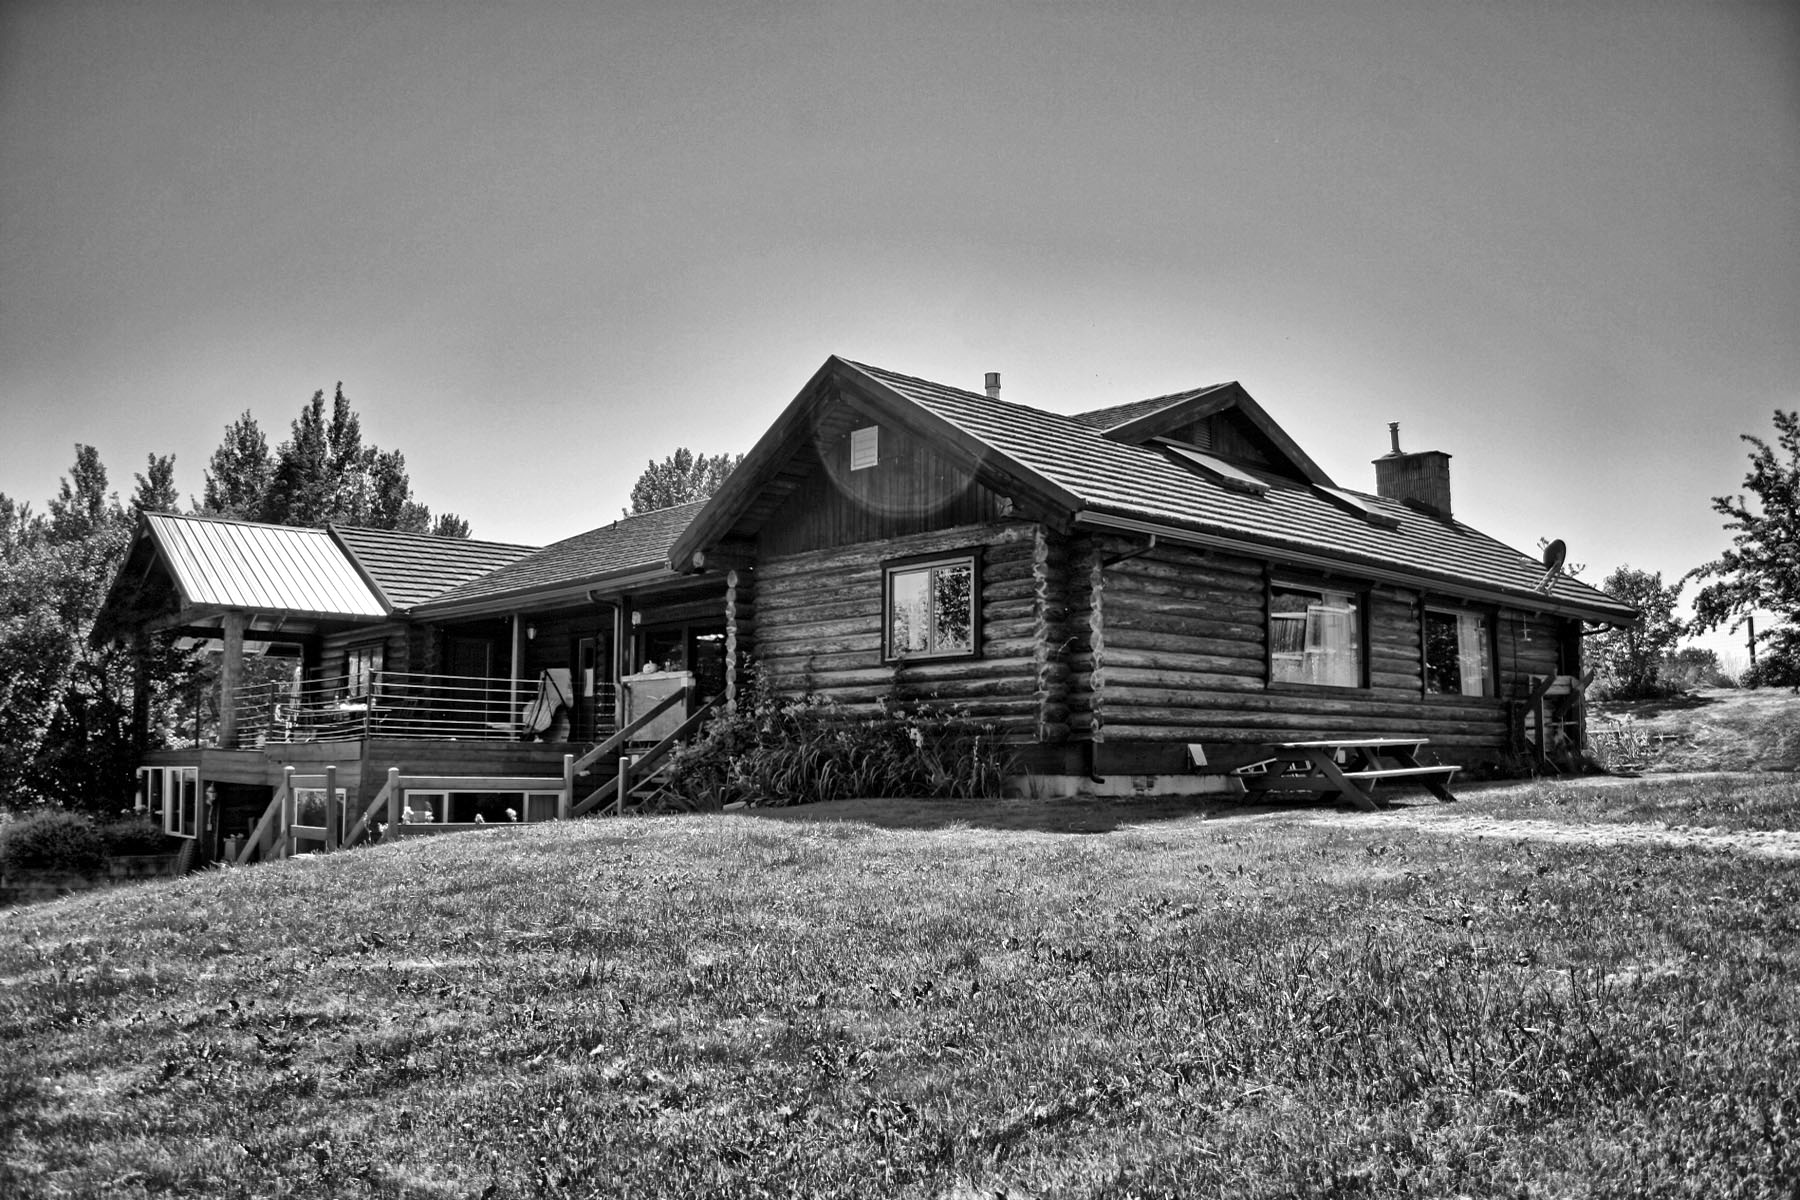 Single Family Home for Sale at Sand Creek Tee Pee House 2306 Sand Creek Lane Sandpoint, Idaho 83864 United States